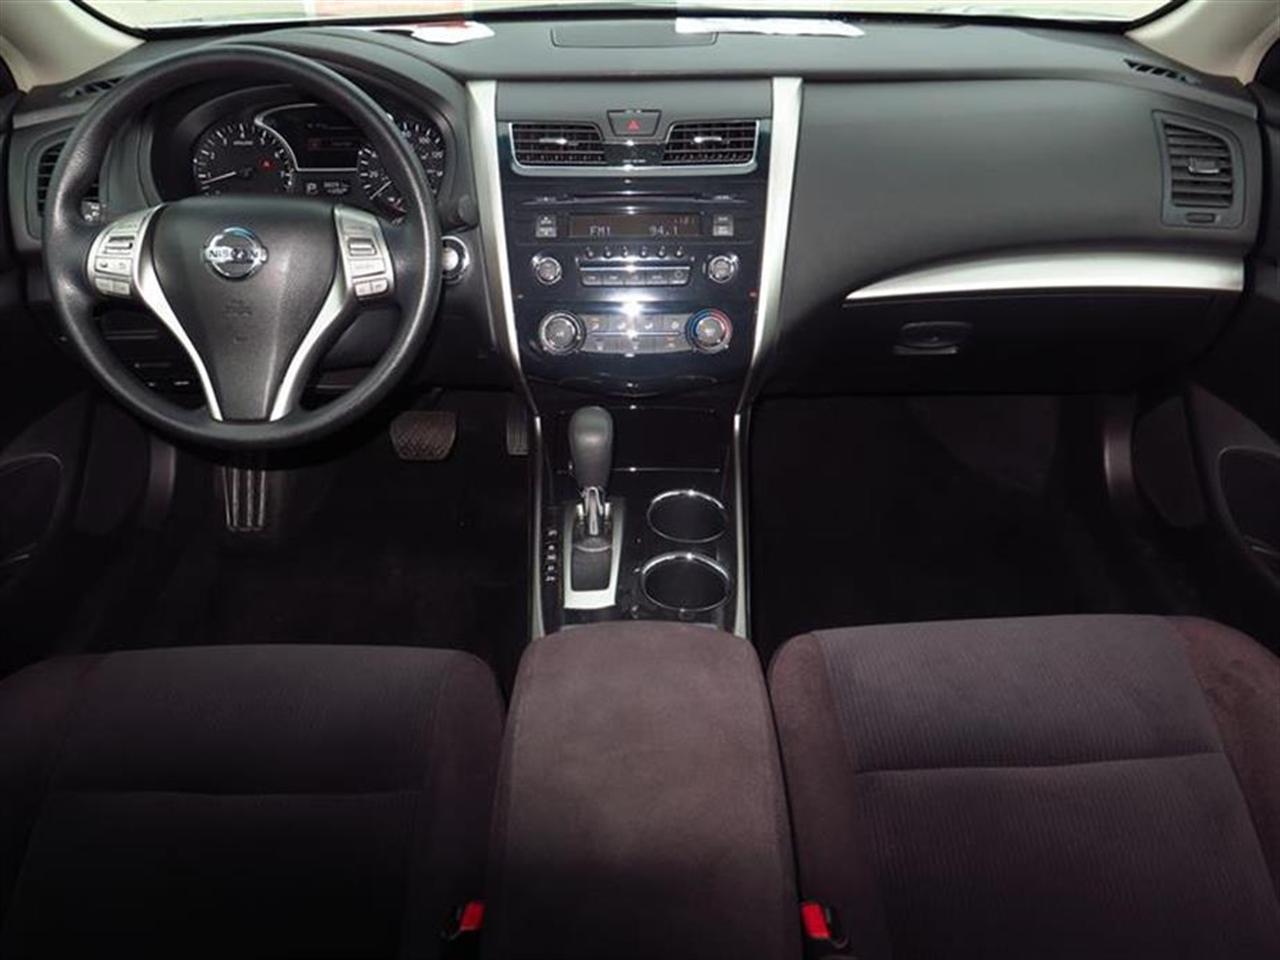 2013 NISSAN ALTIMA 4dr Sdn I4 25 S 38090 miles 6040 split-folding rear seat 6-way pwr driver